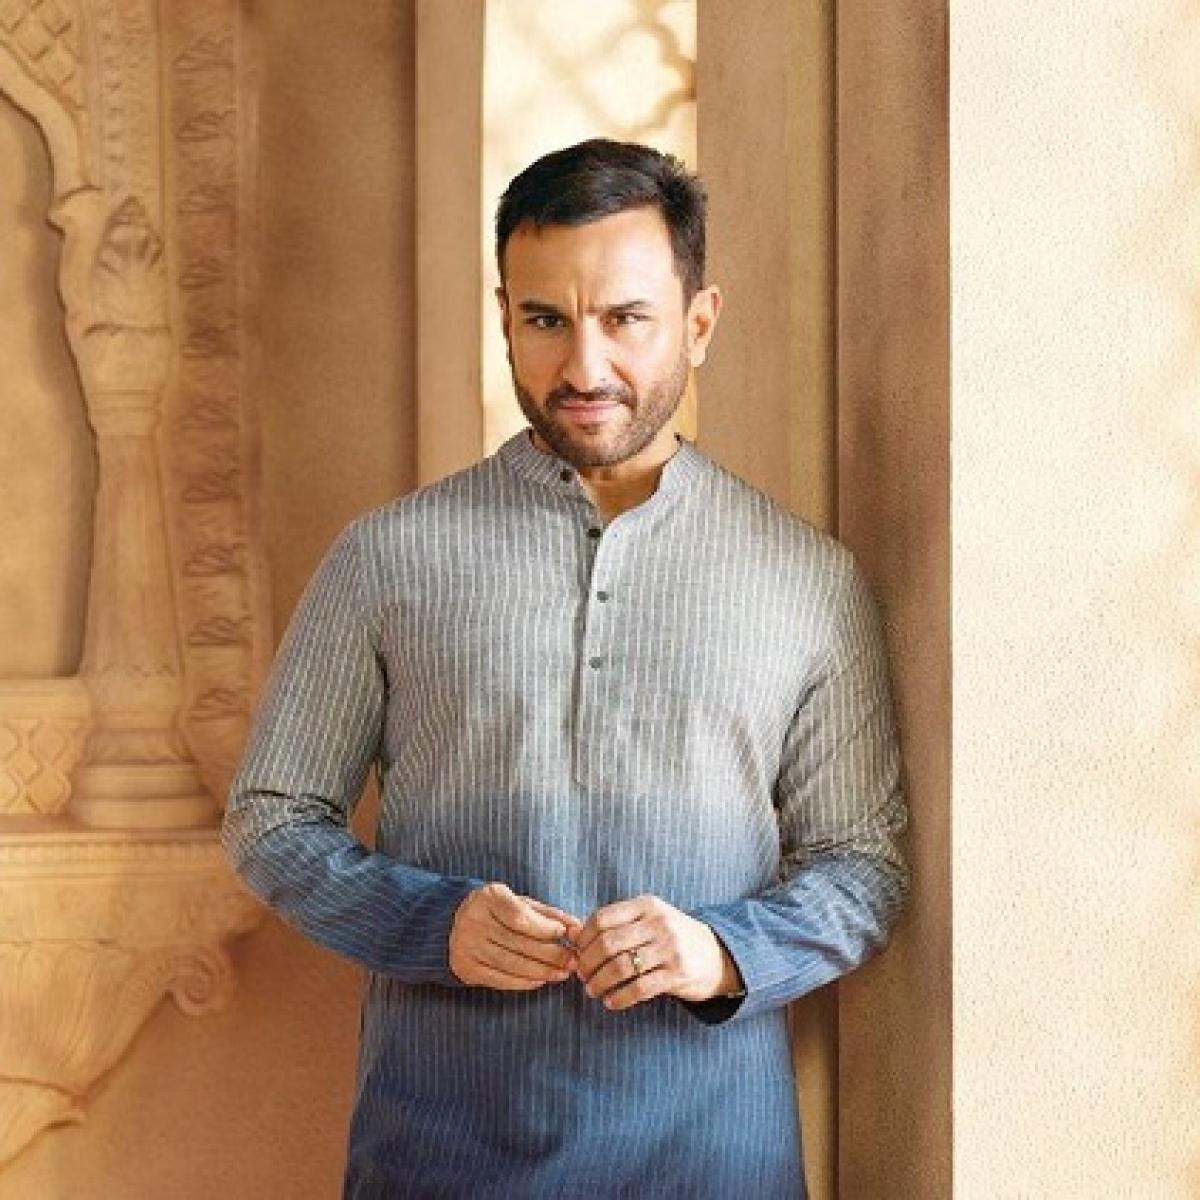 'Indian entertainment industry going through a renaissance,' says Saif Ali Khan